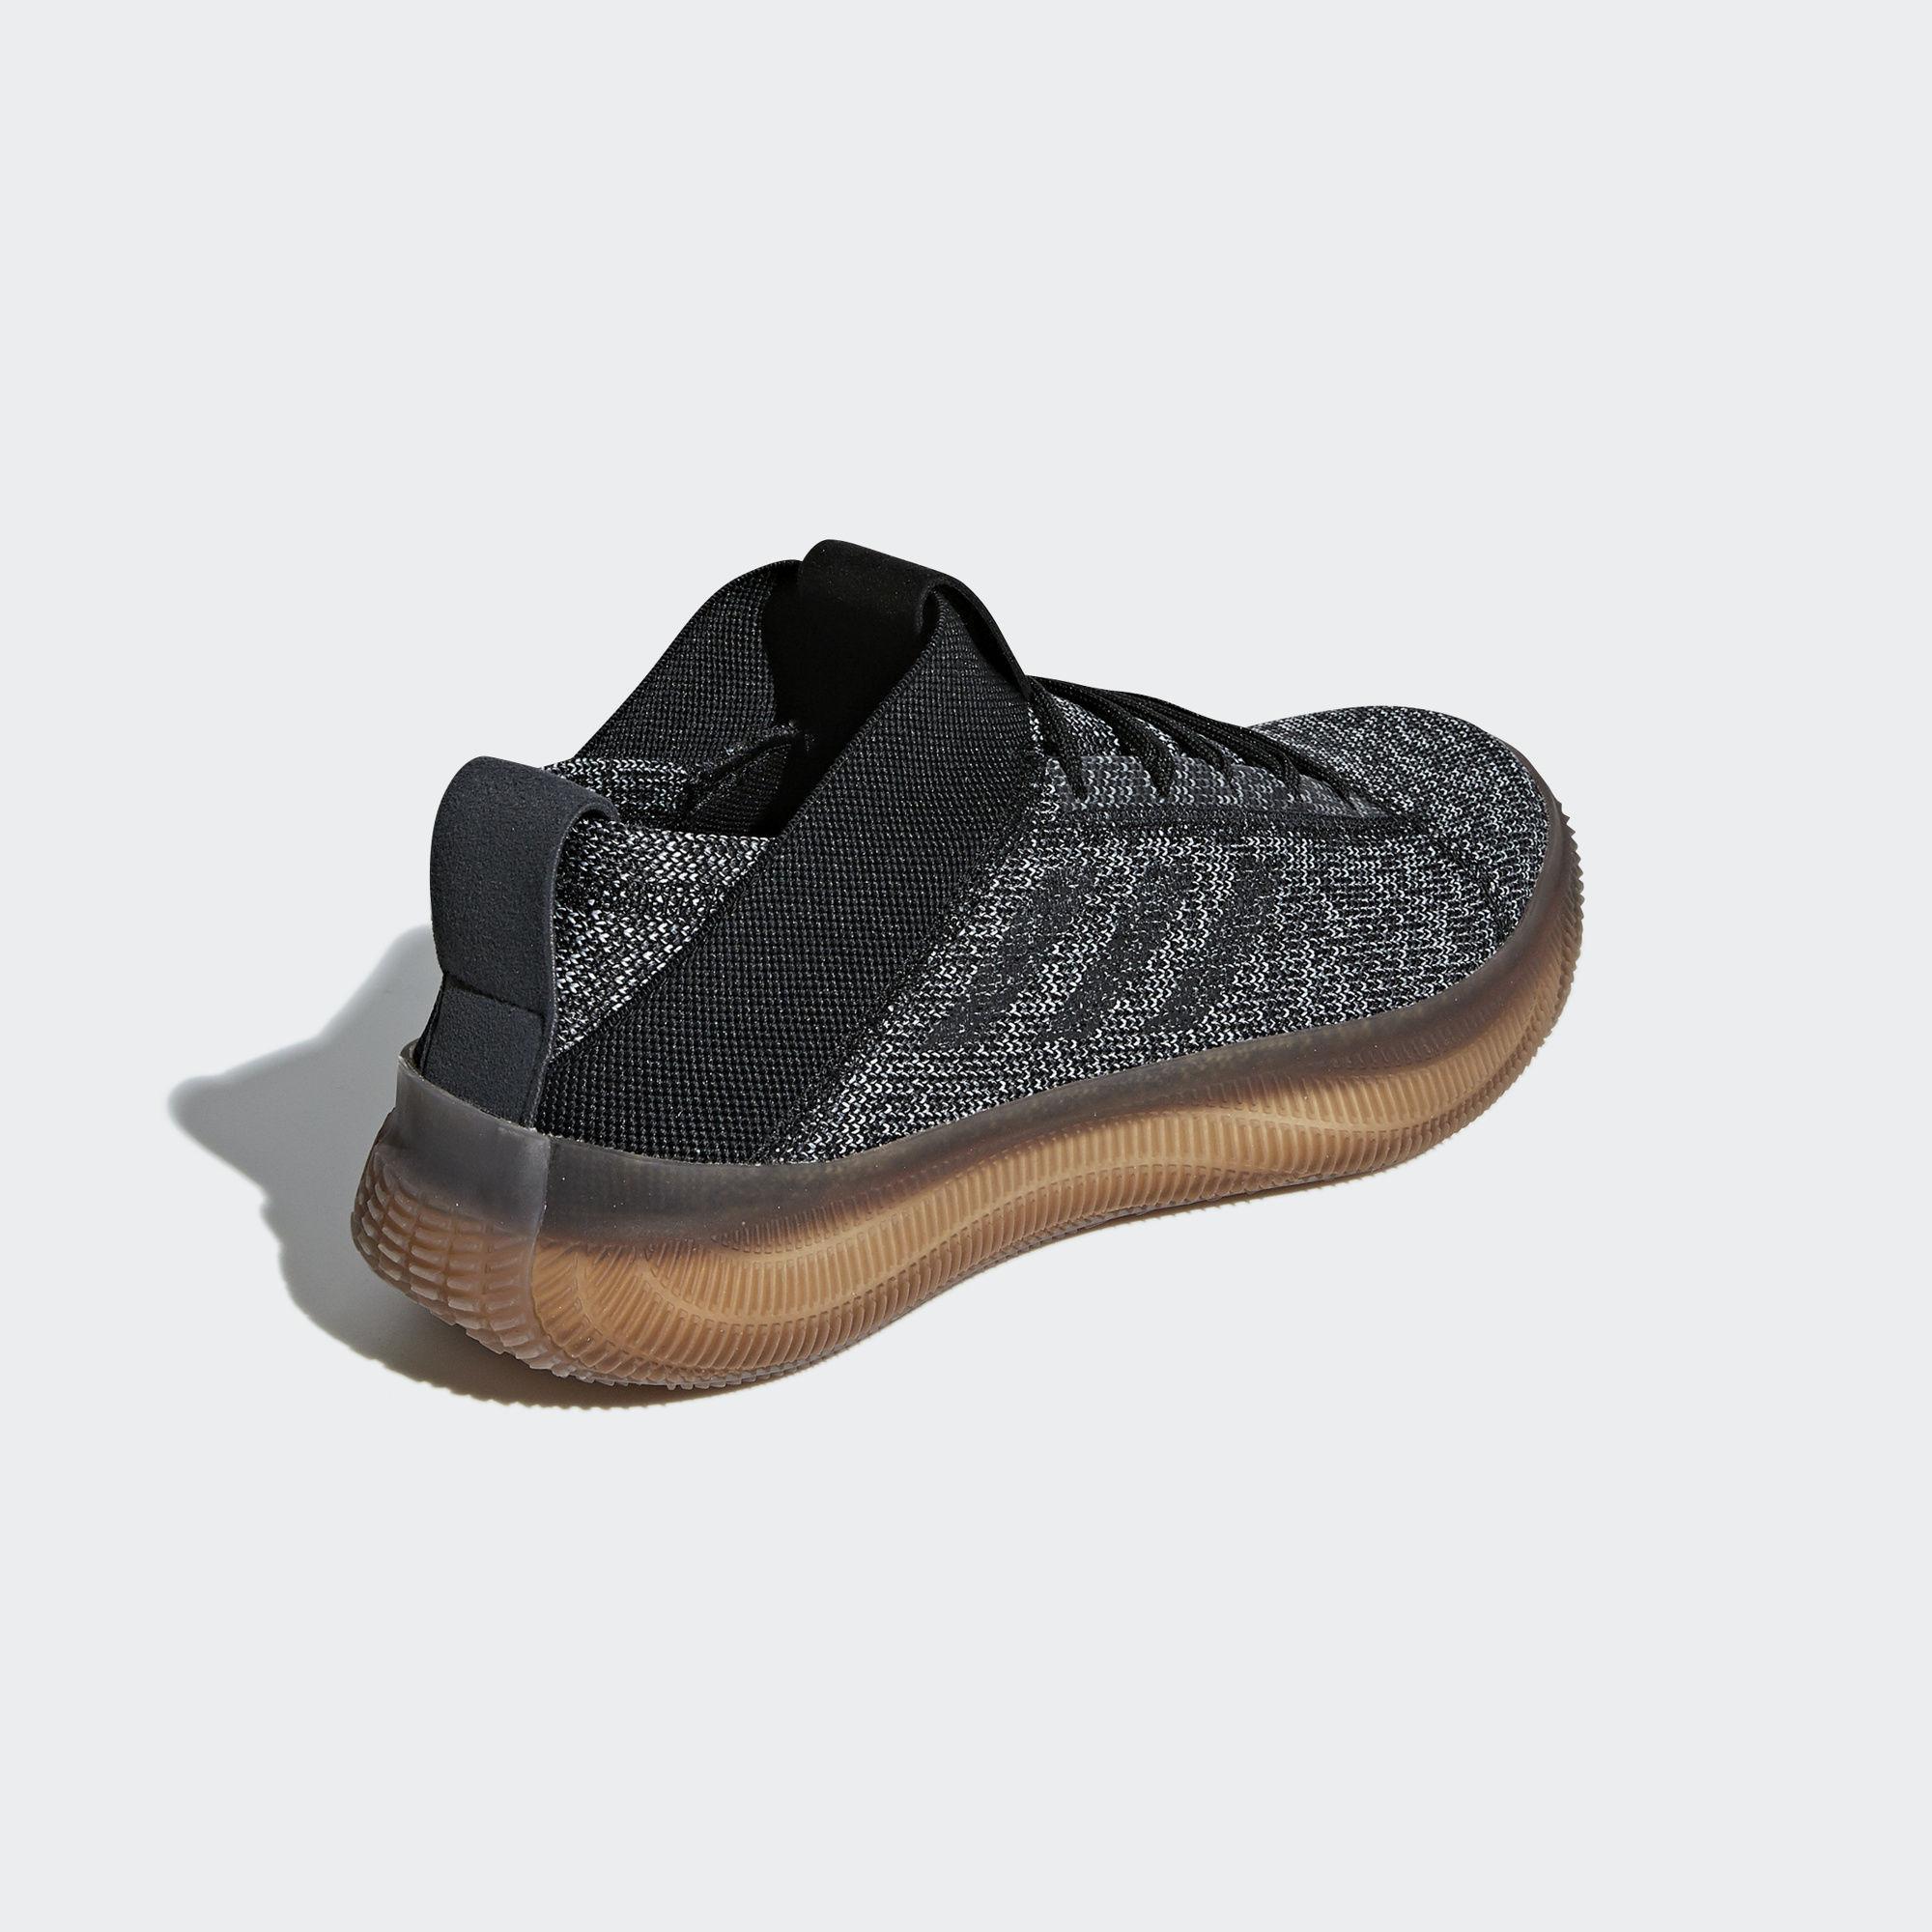 8446b723efdfe Adidas - Black Pureboost Trainer Shoes for Men - Lyst. View fullscreen